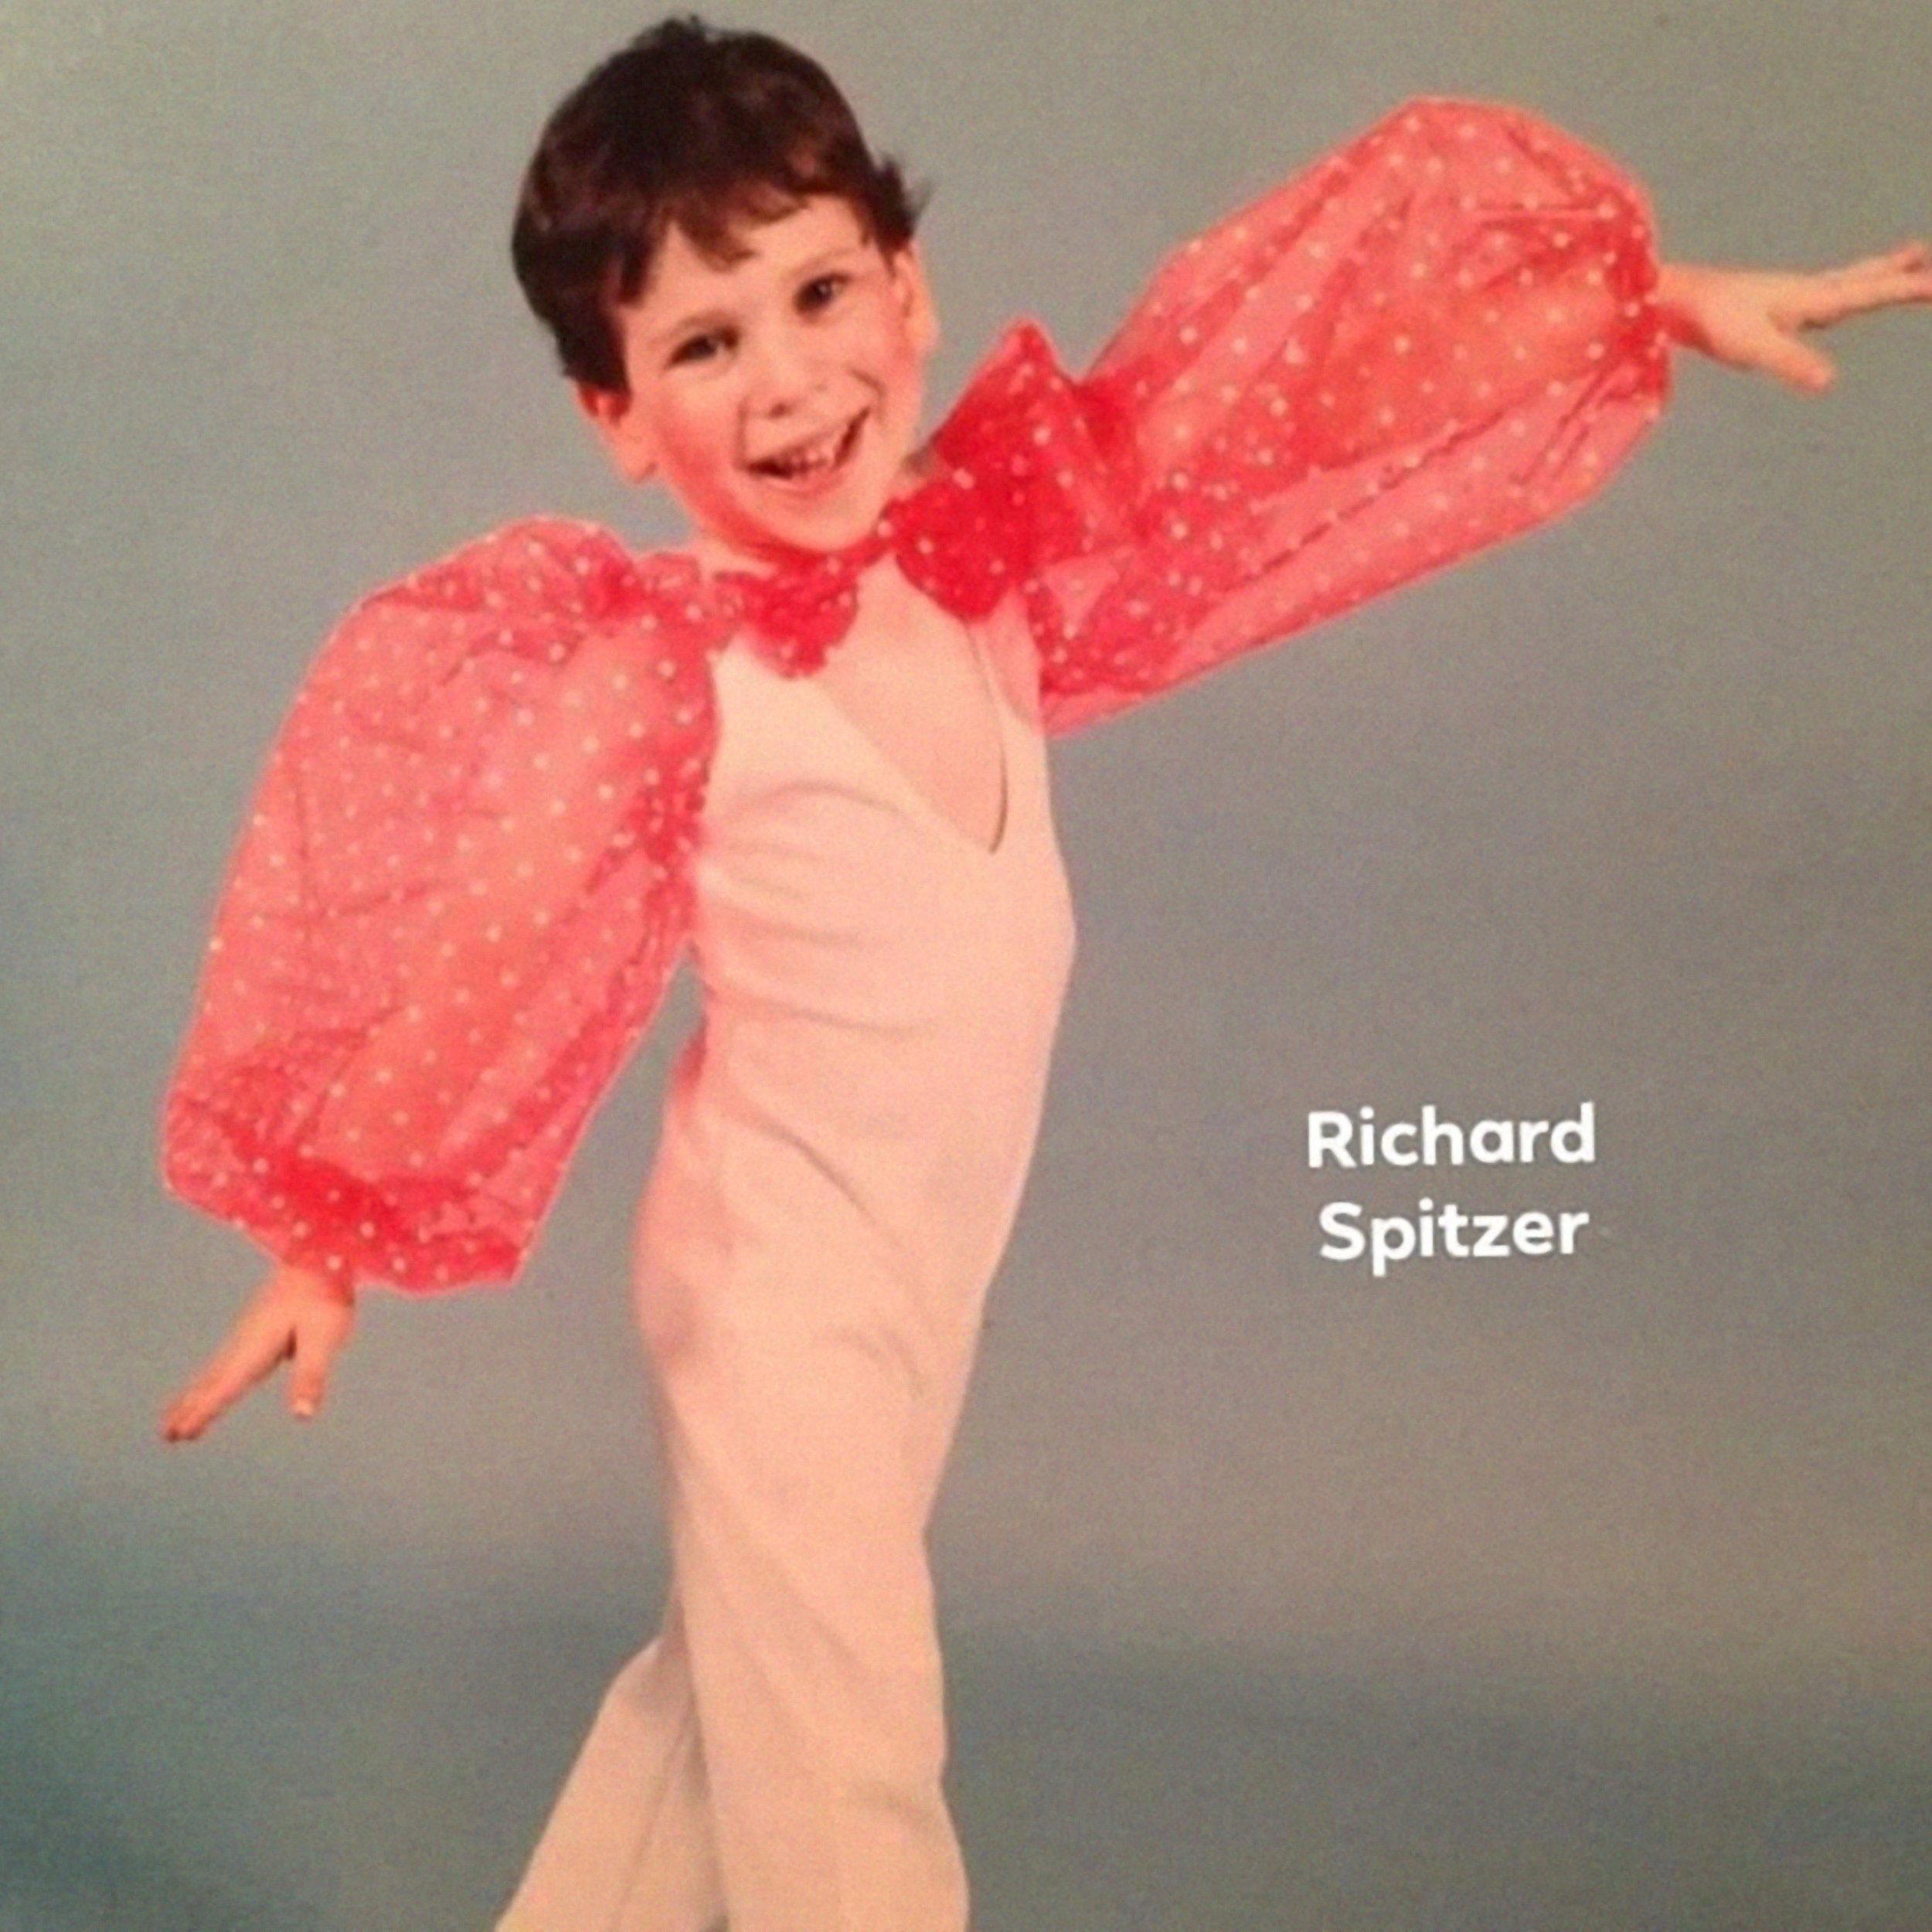 richard spitzer - richard spitzer